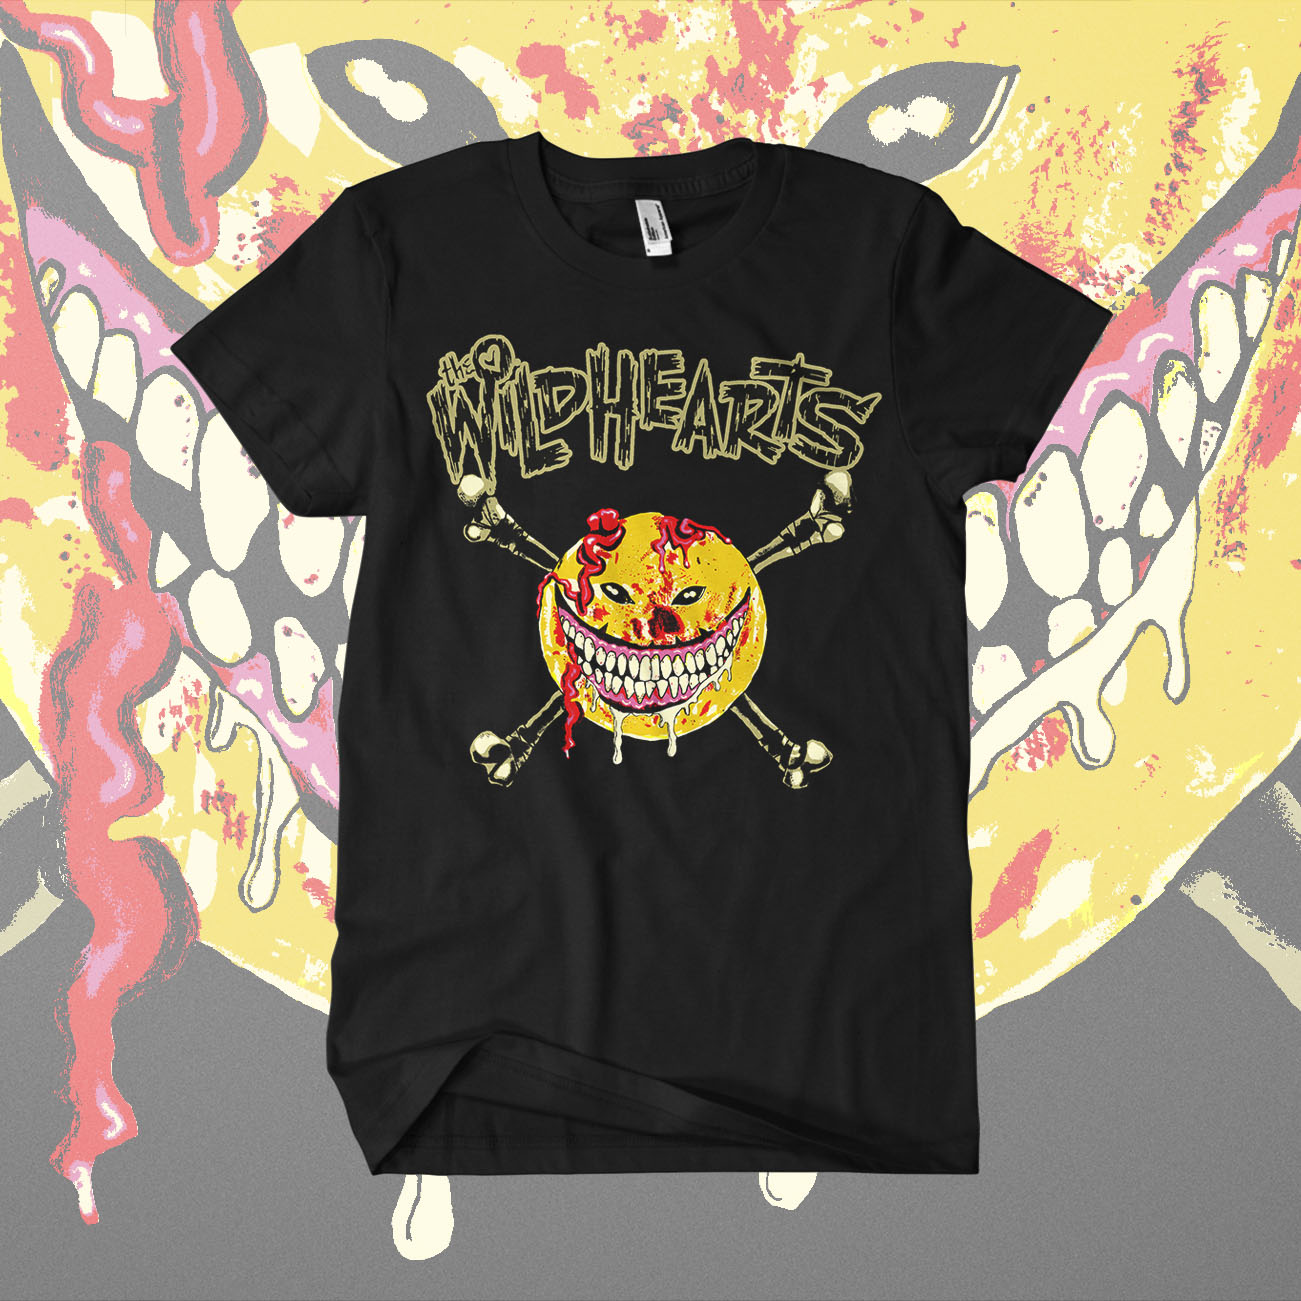 The Wildhearts - 'Smiley Drip' T-Shirt - The Wildhearts